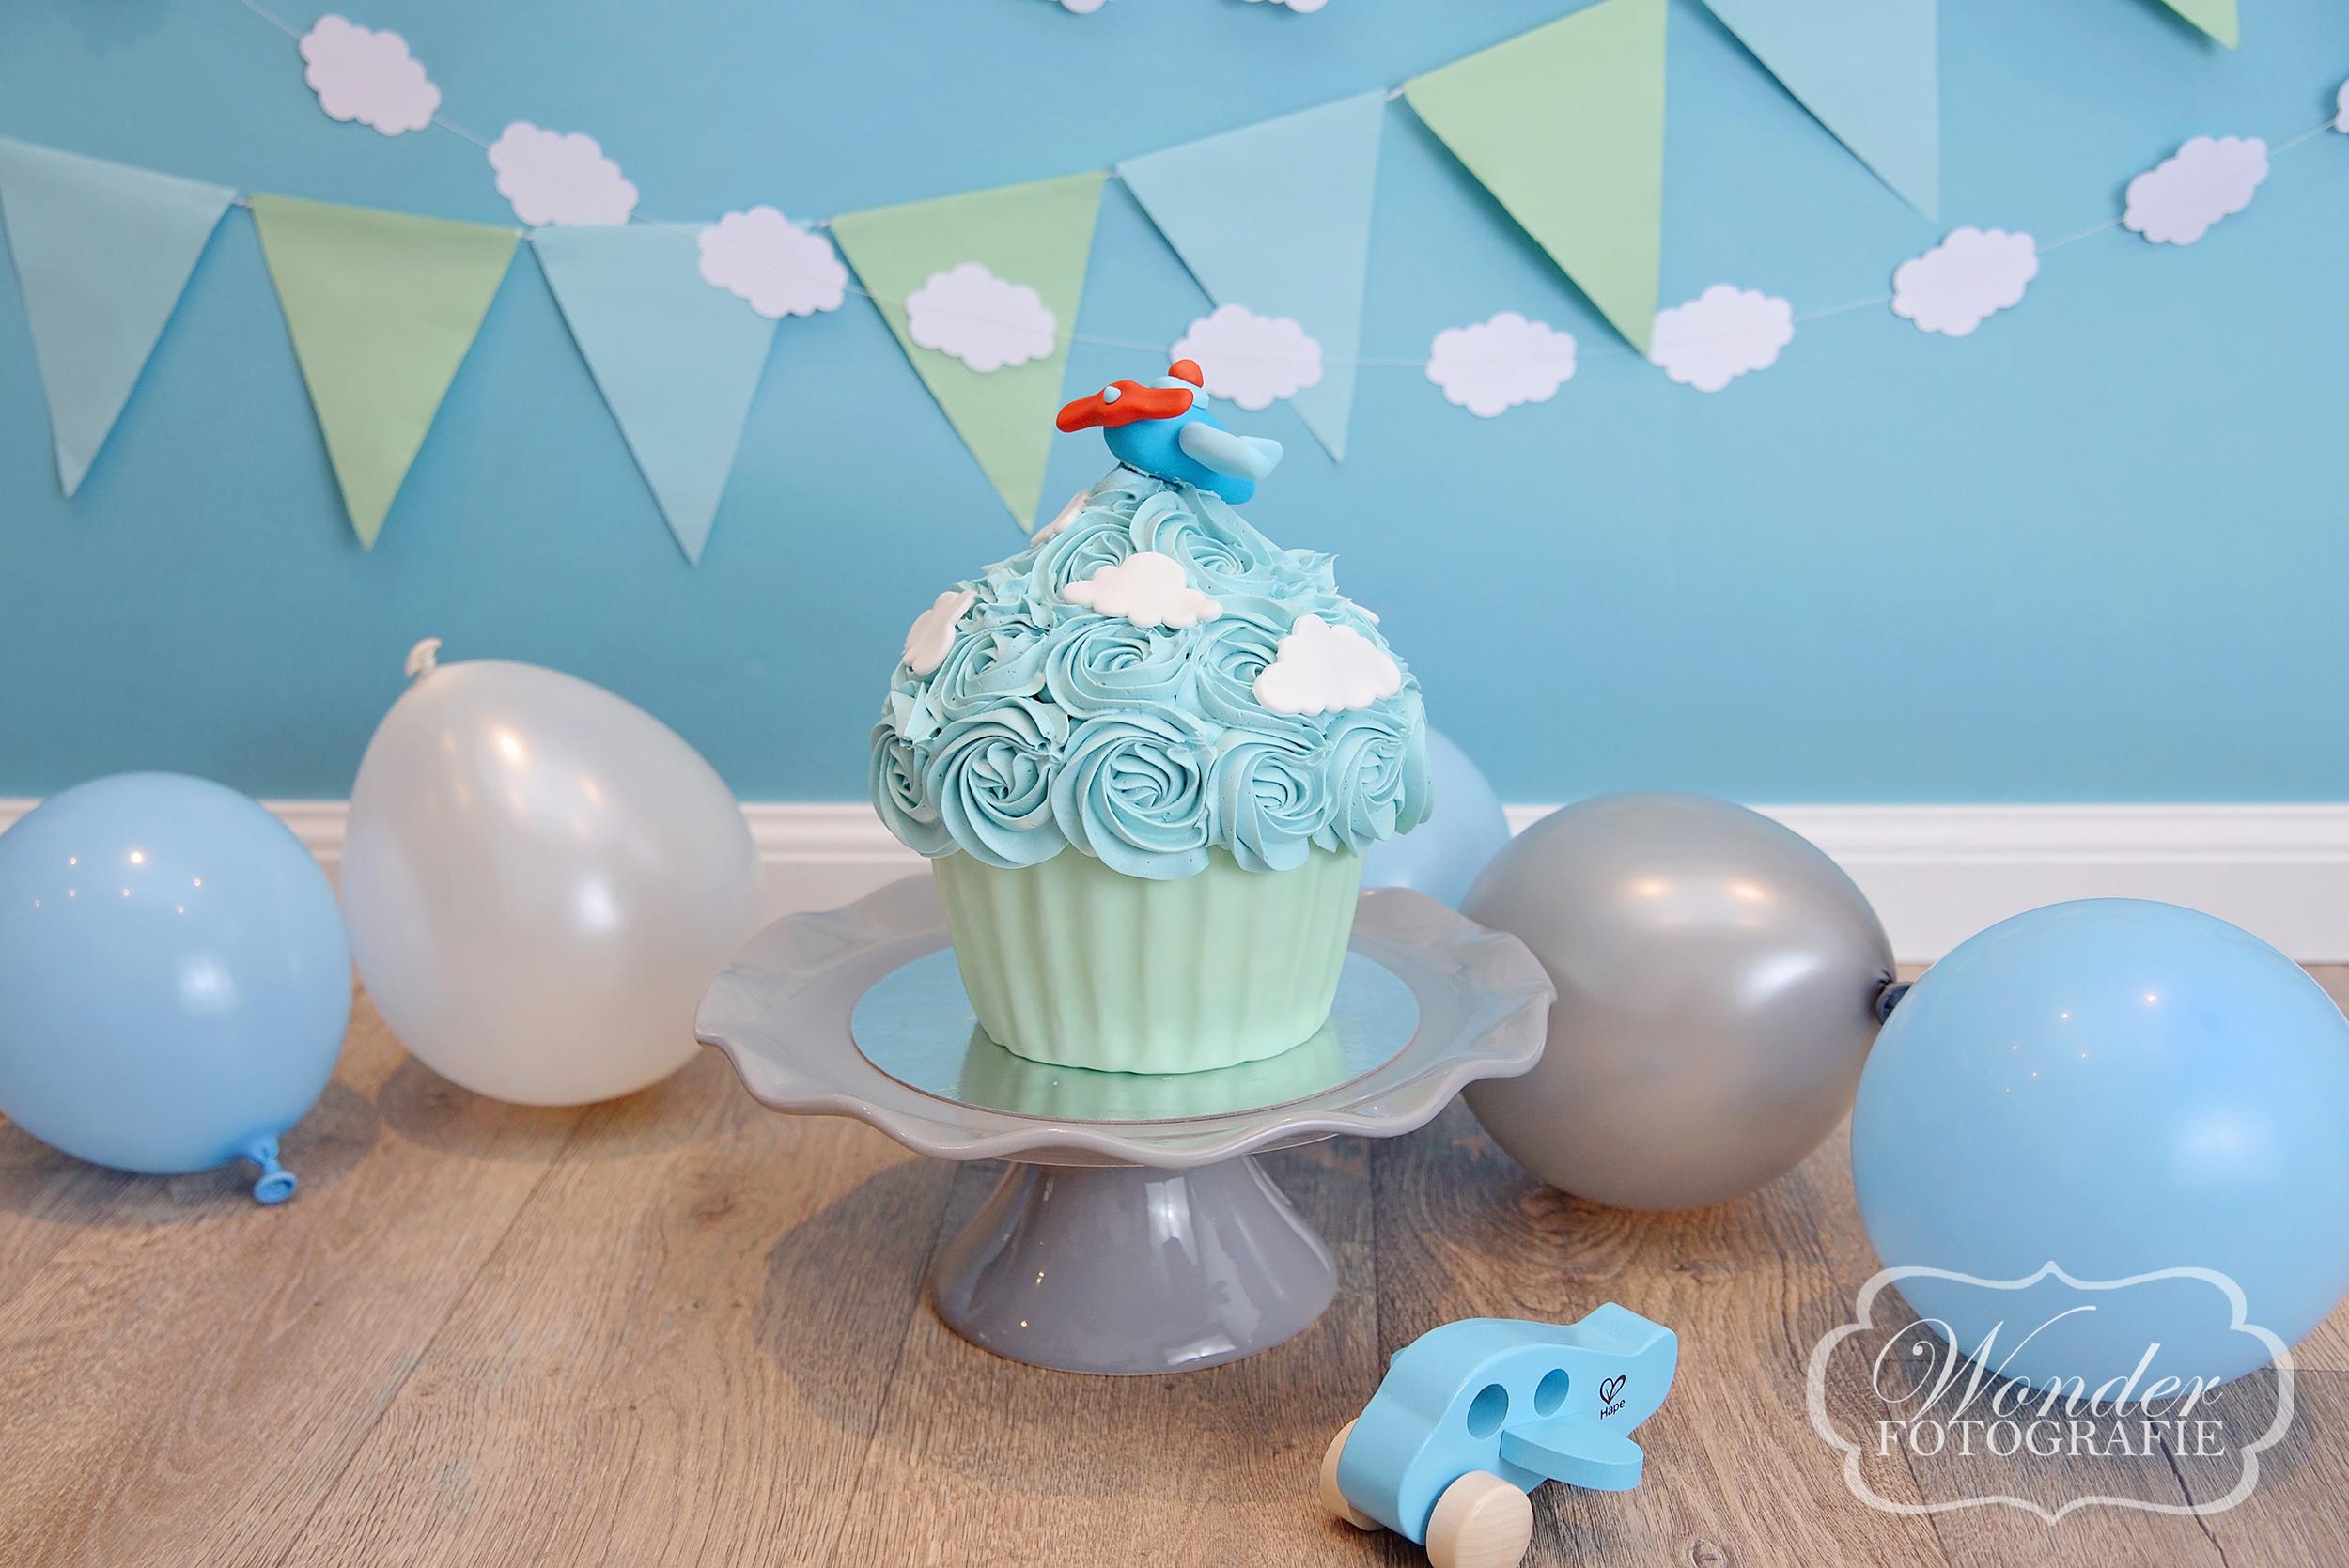 Cake Smash Piloten vliegtuig thema Fotograaf almere airplane theme